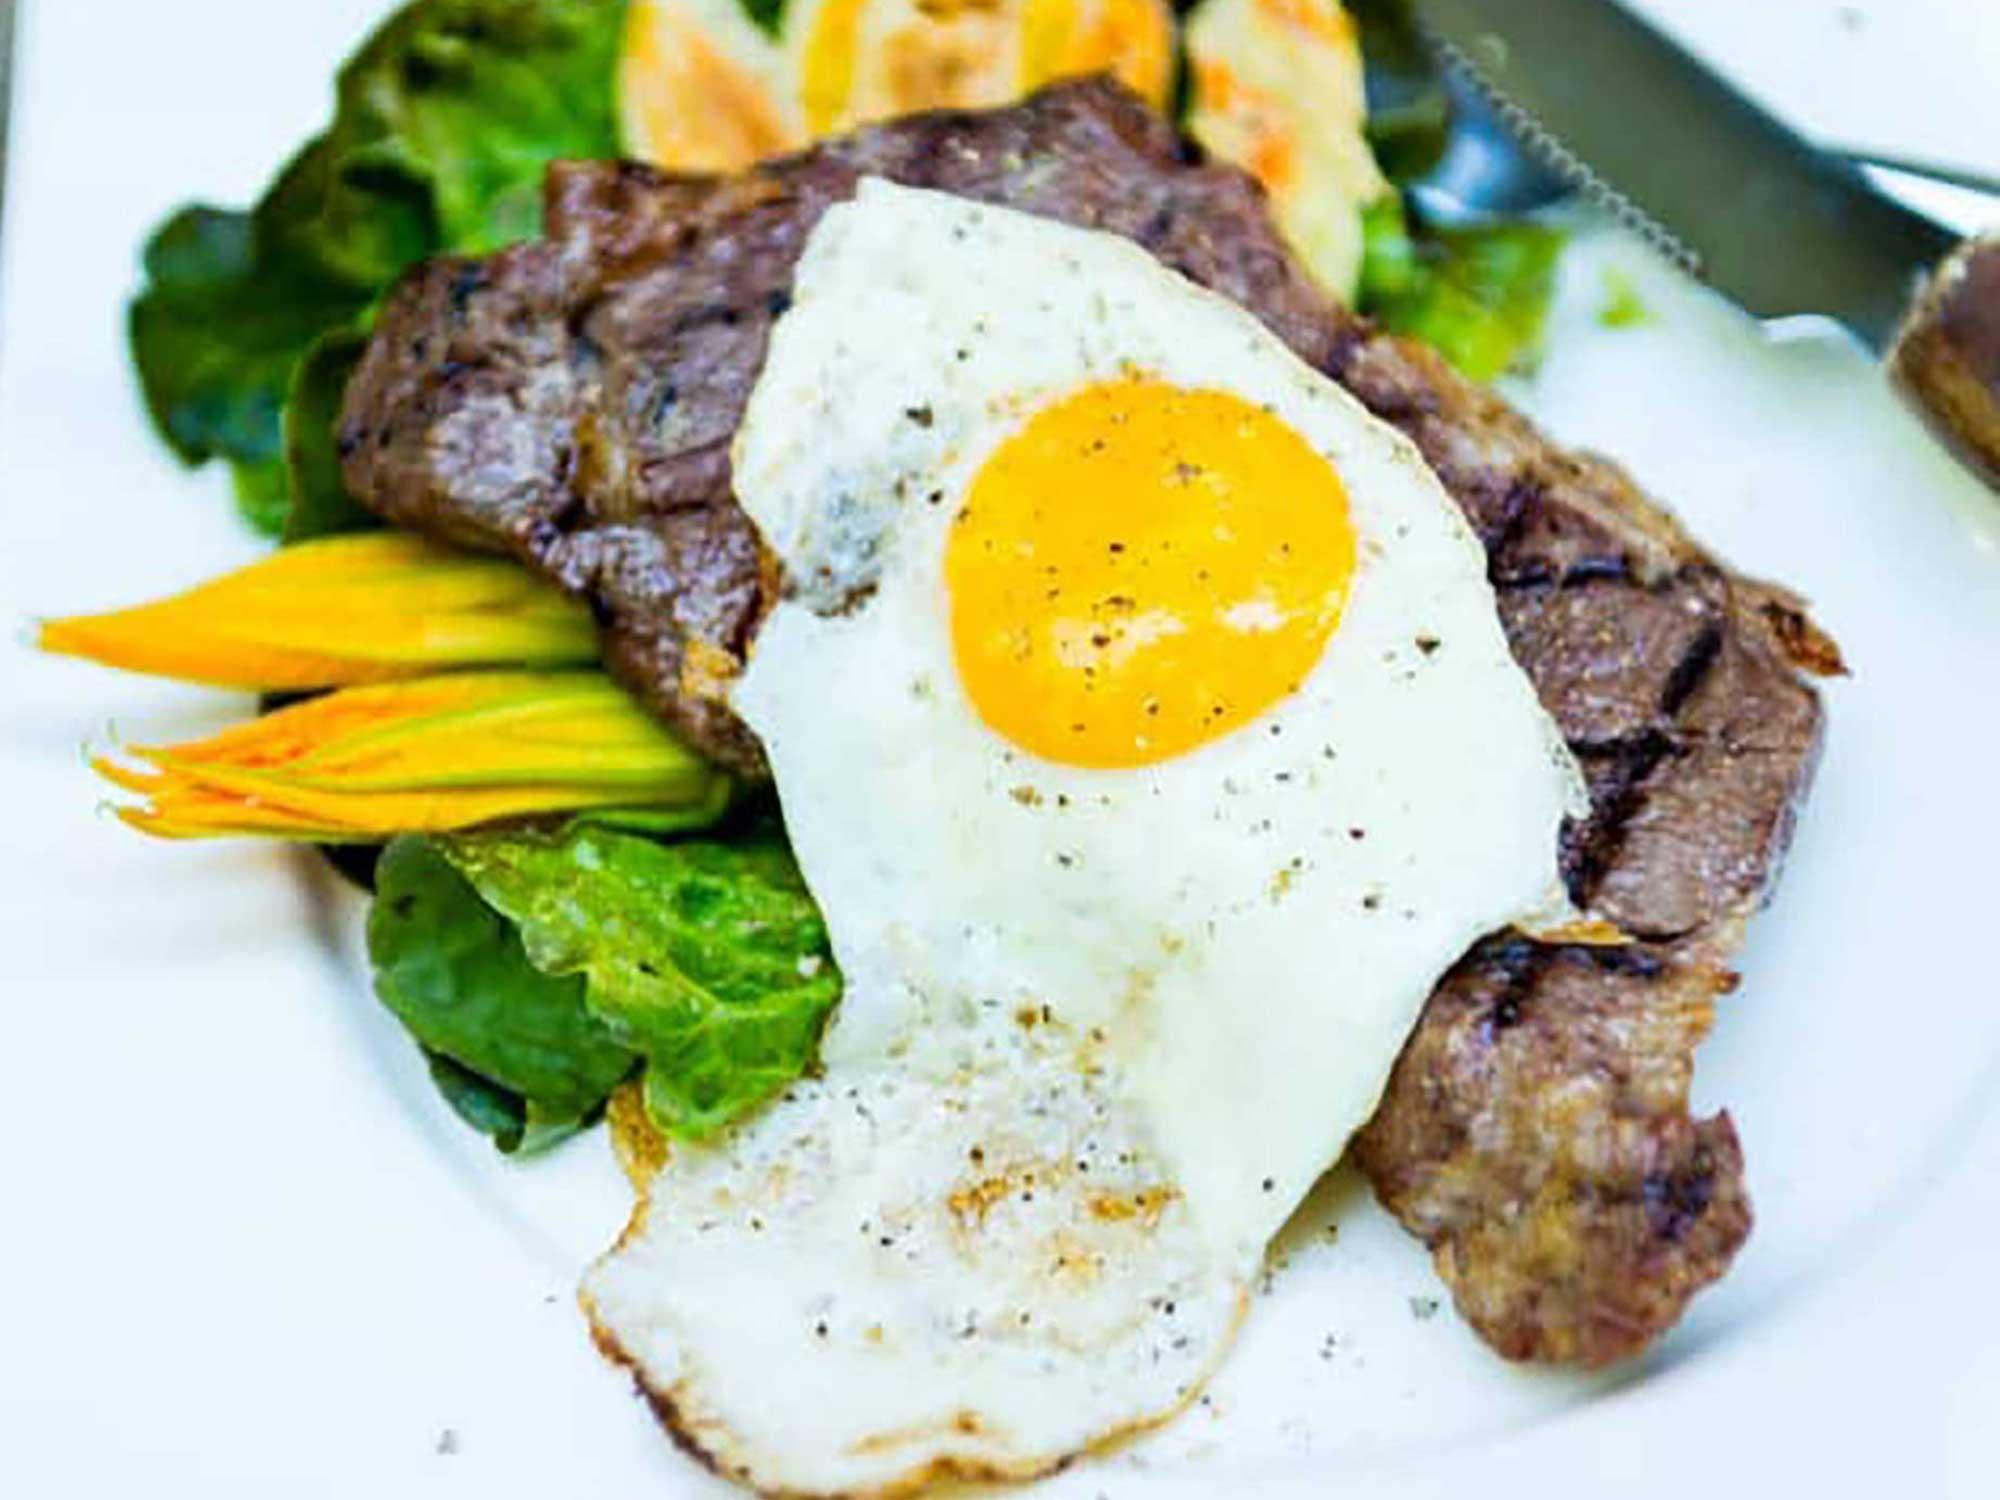 Sous Vide Steak and Eggs